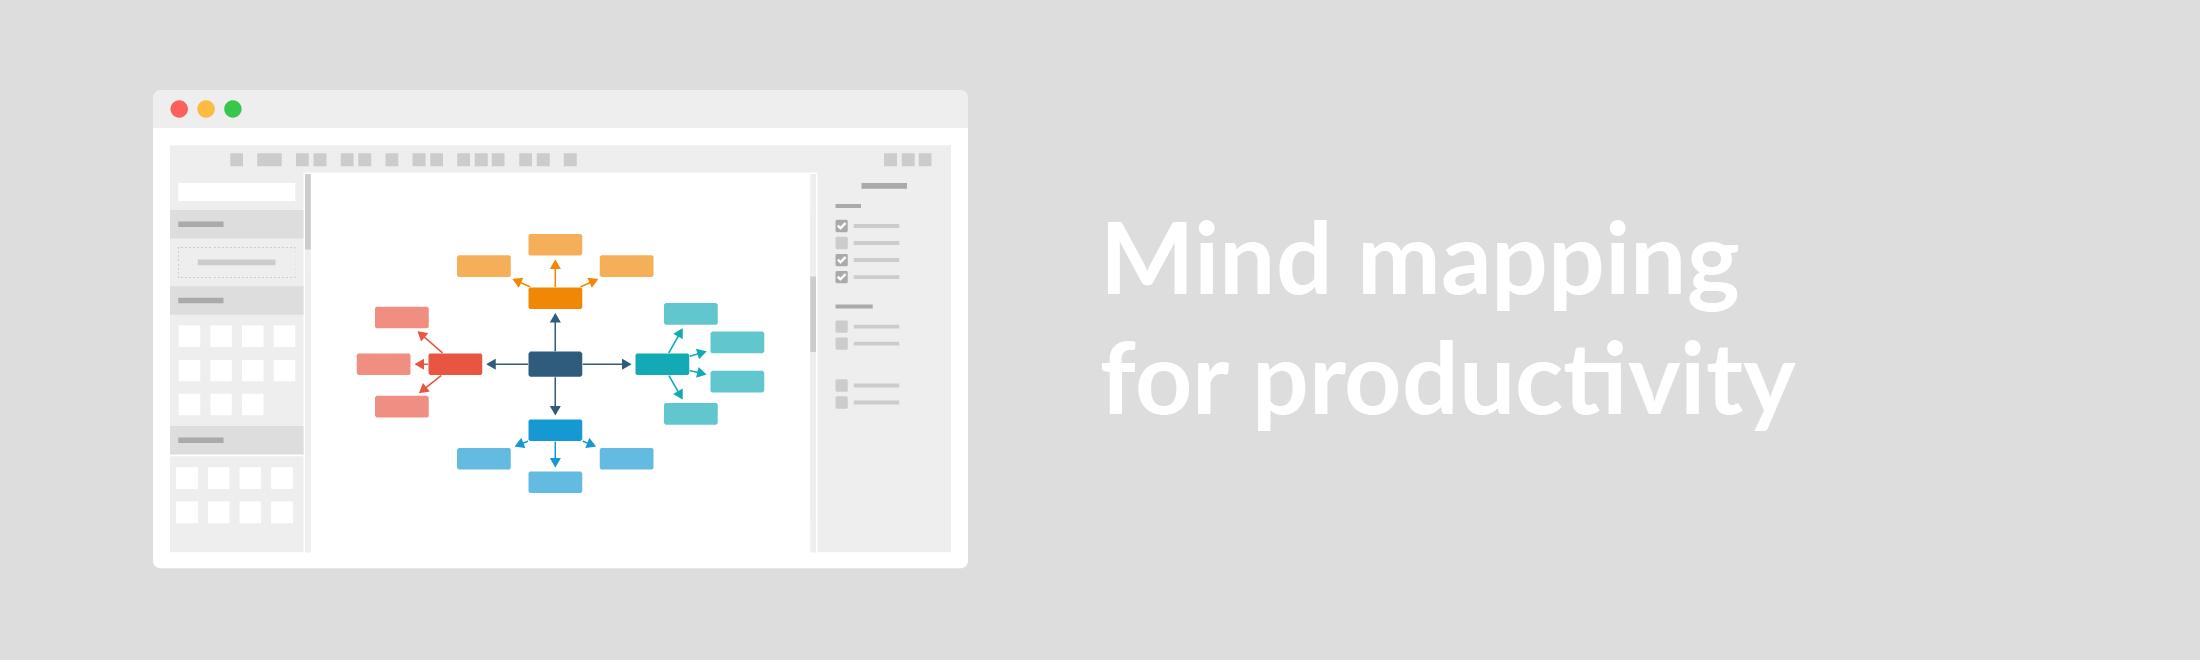 increase productivity with mindmaps